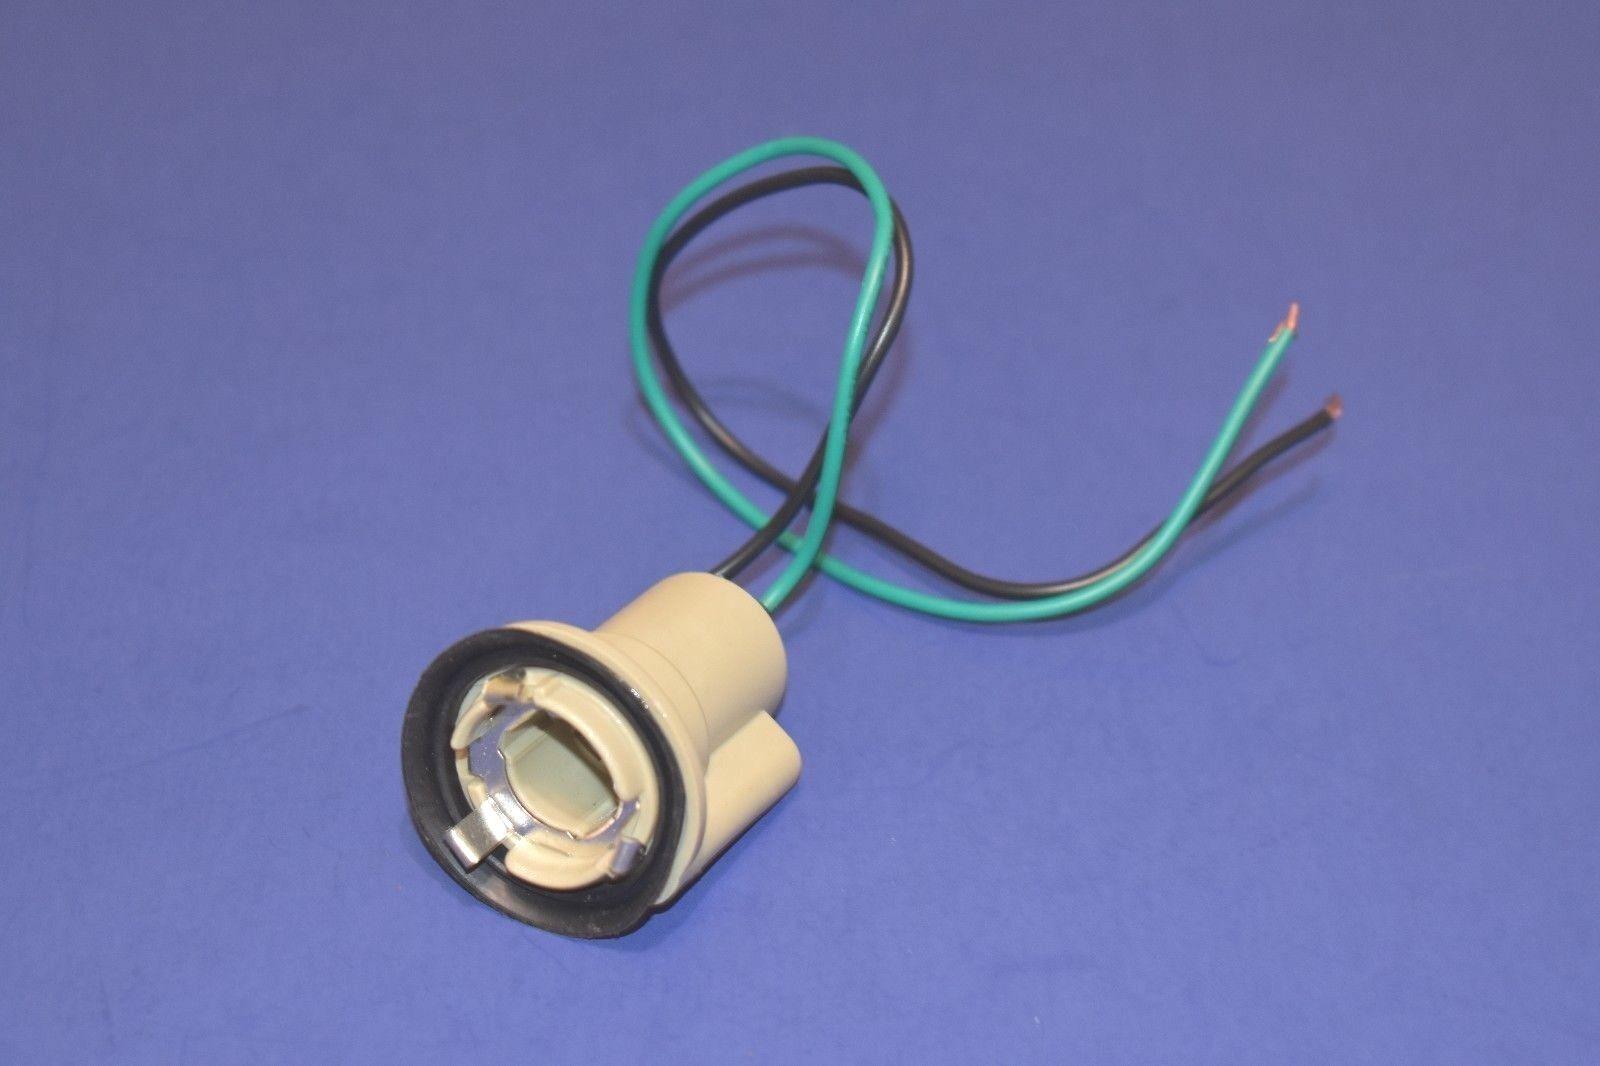 Buick 1 Contact Back Lamp Reverse Light Socket 1969 - 1990